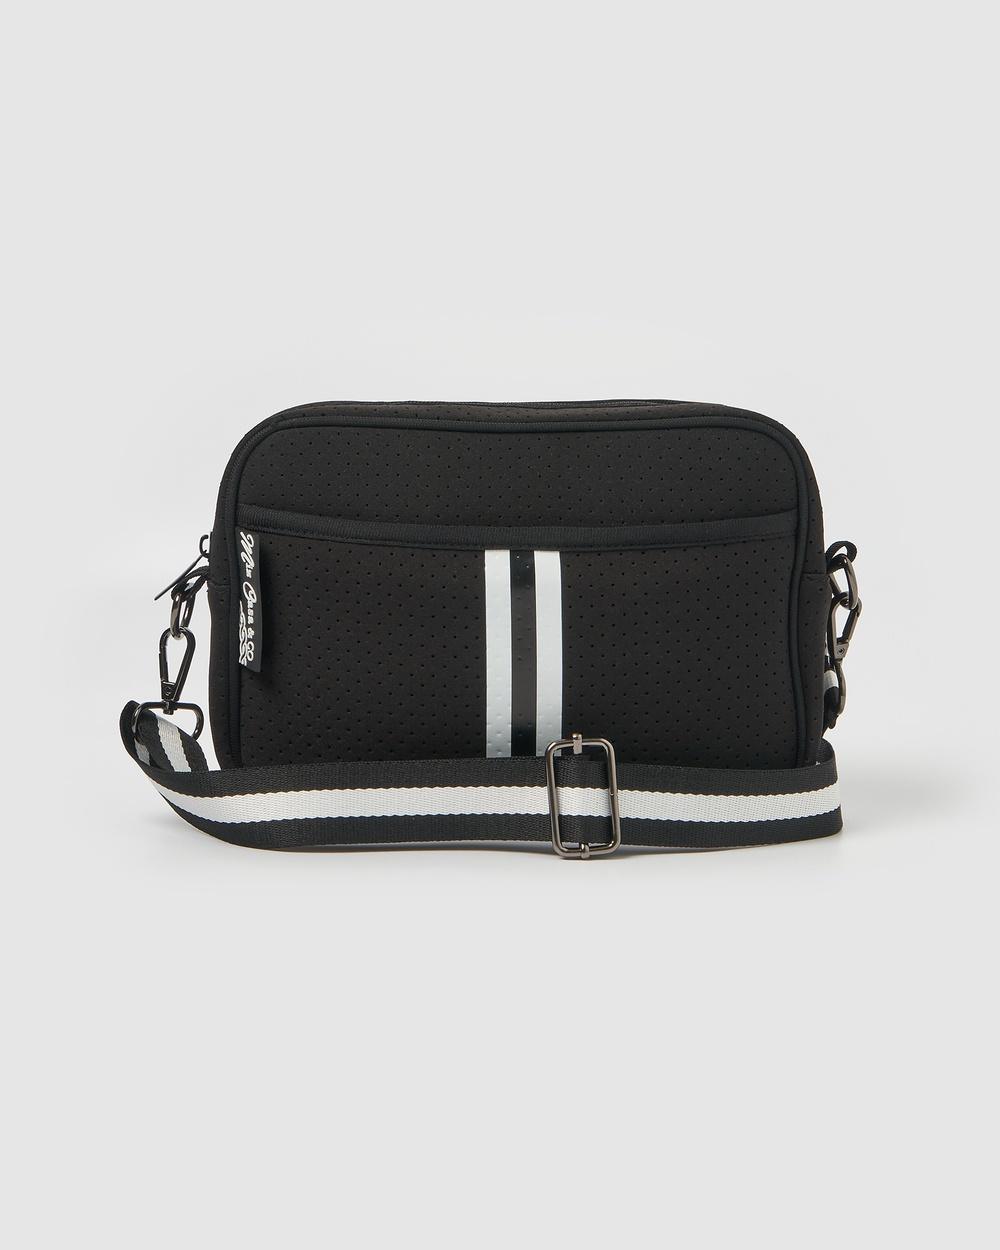 Miz Casa and Co Lola Crossbody Neoprene Bag Bags Black